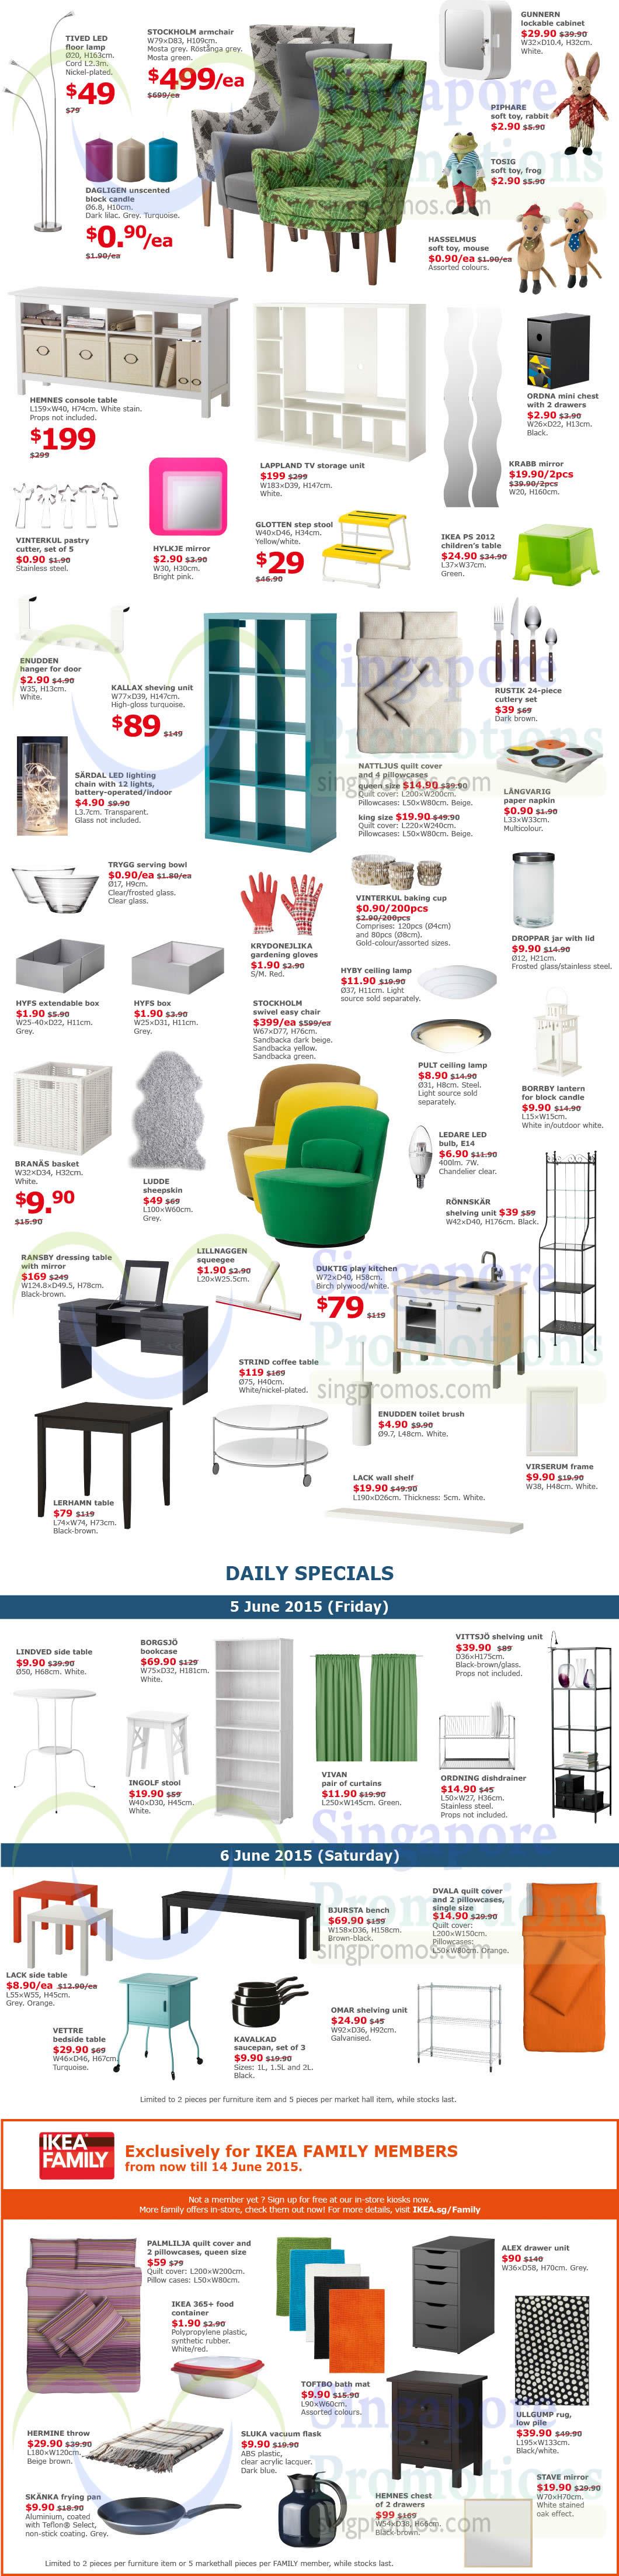 ikea ultimate offers promotion 5 6 jun 2015. Black Bedroom Furniture Sets. Home Design Ideas